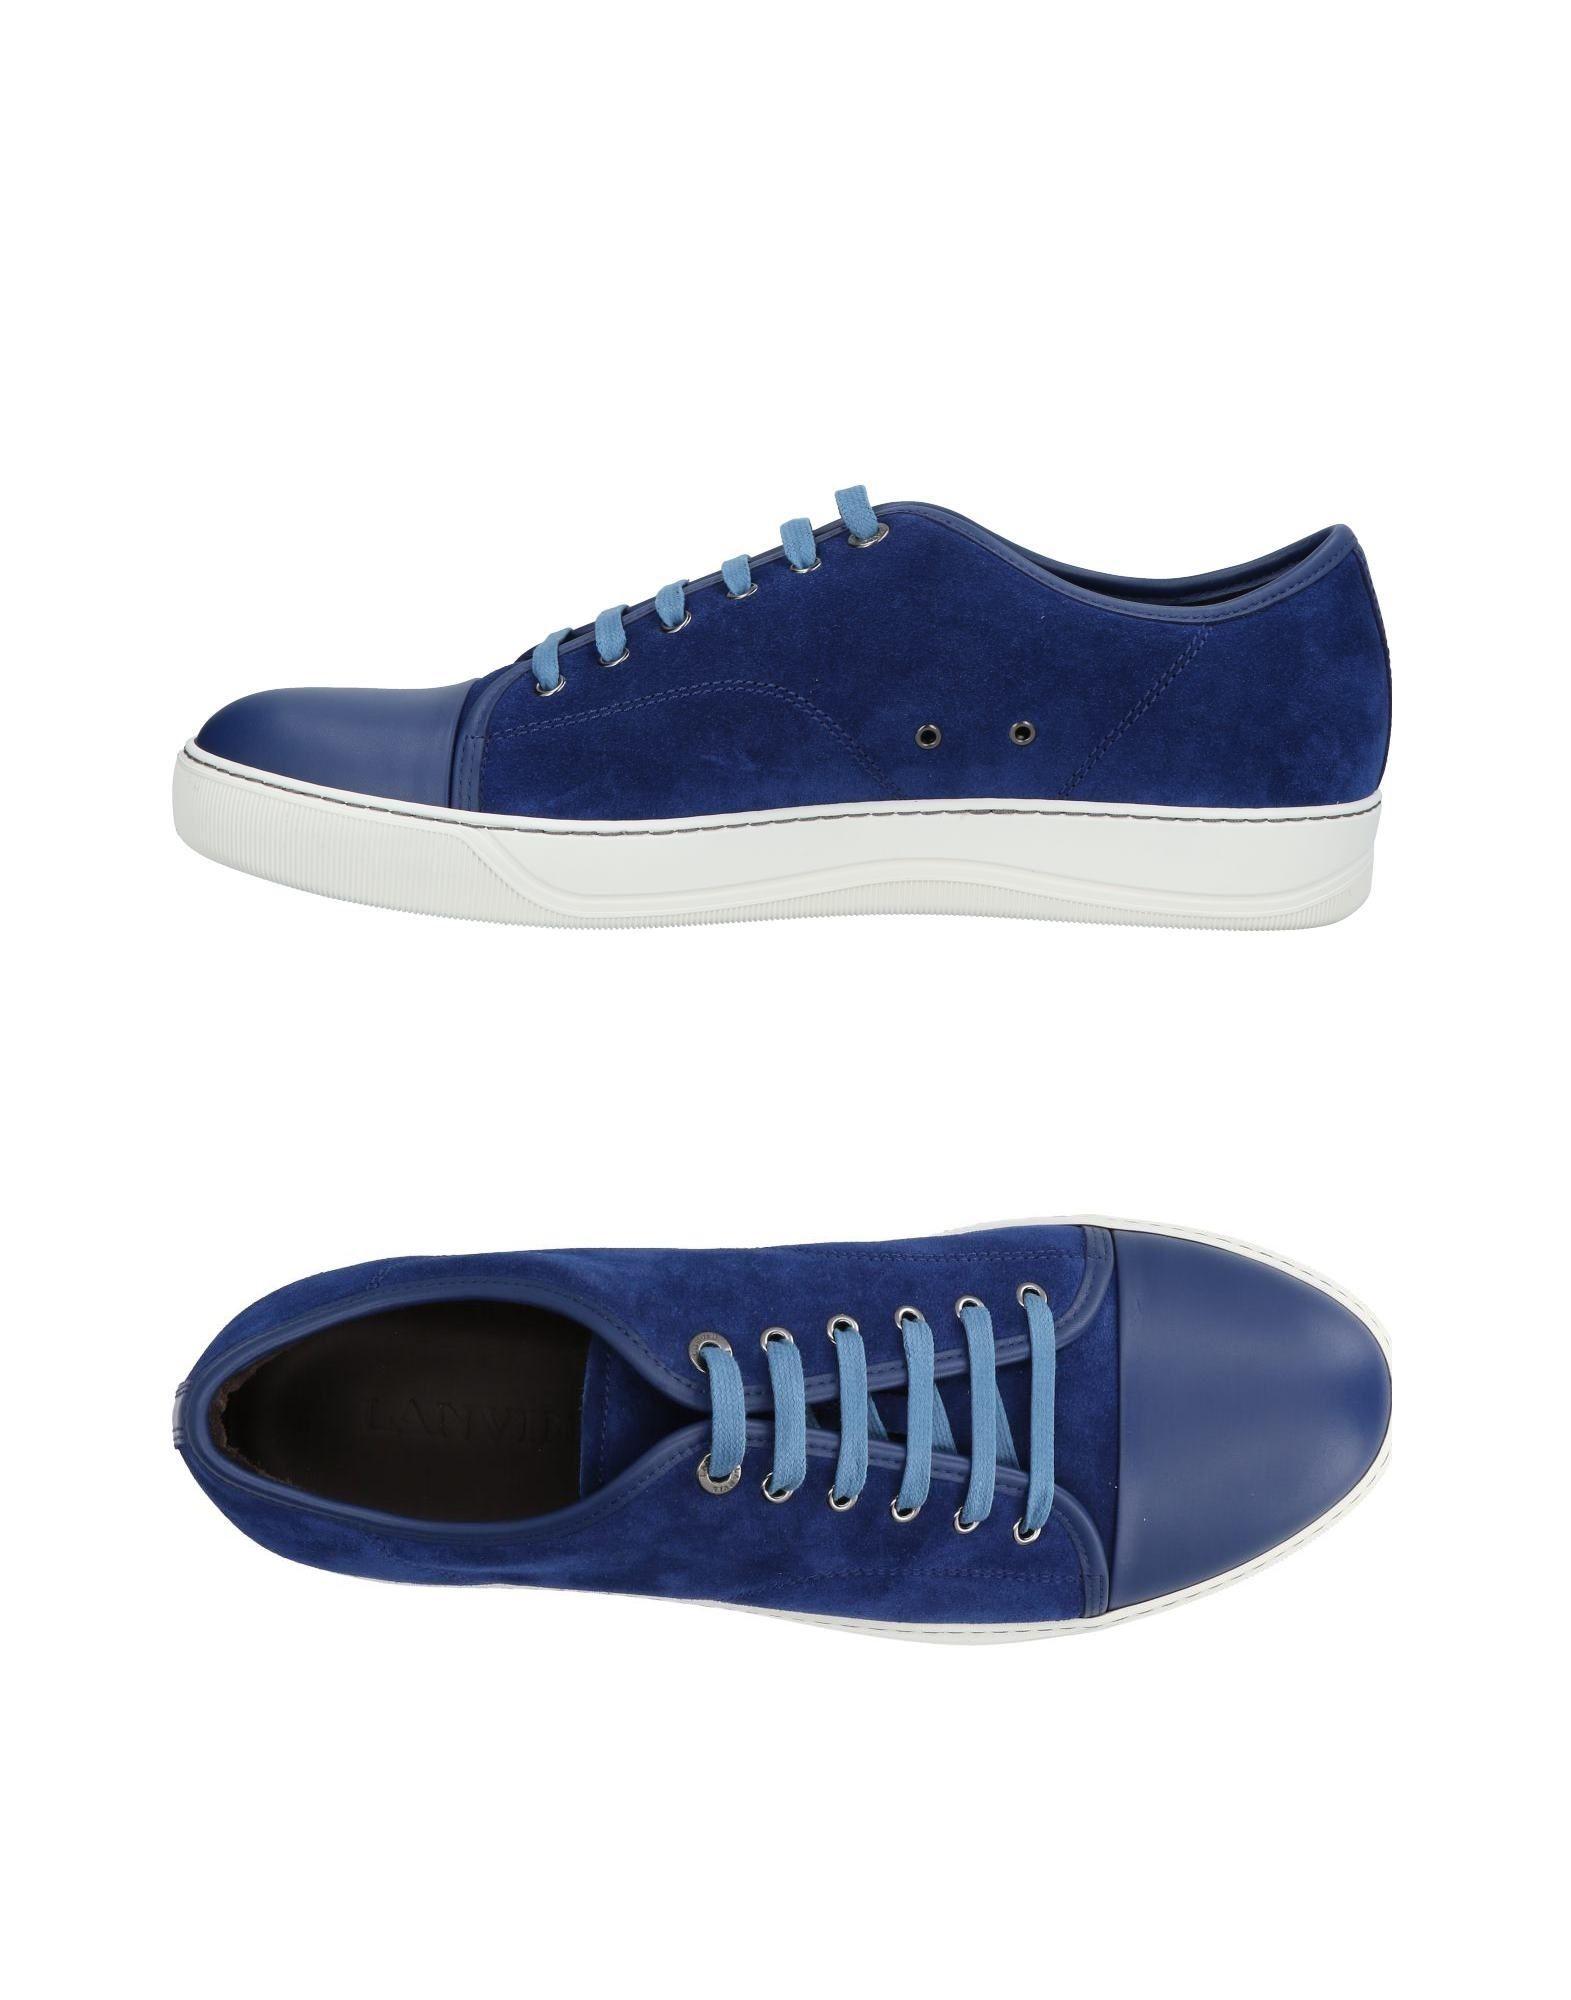 Lanvin Sneakers Gute Herren  11264827NS Gute Sneakers Qualität beliebte Schuhe 7f296a